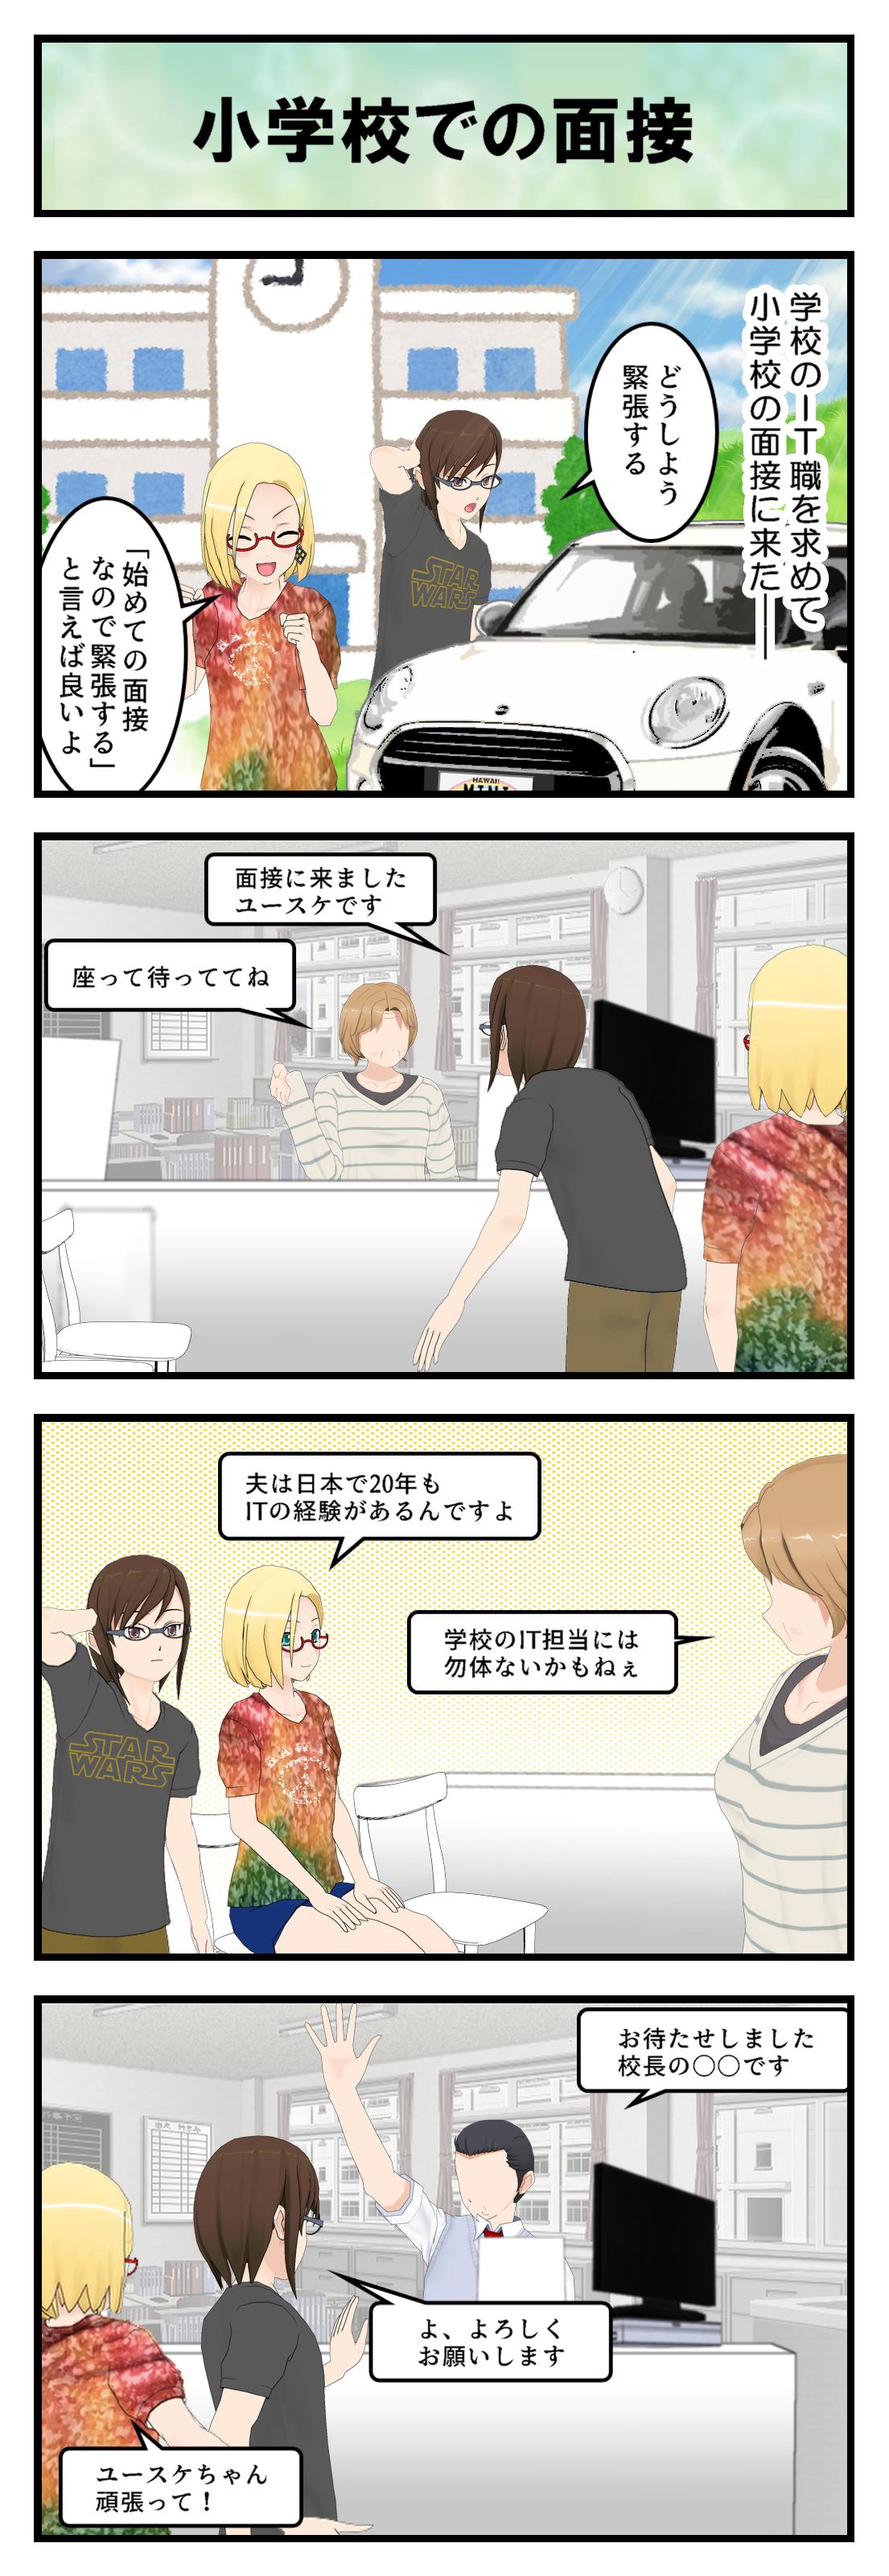 R434_小学校面接_001